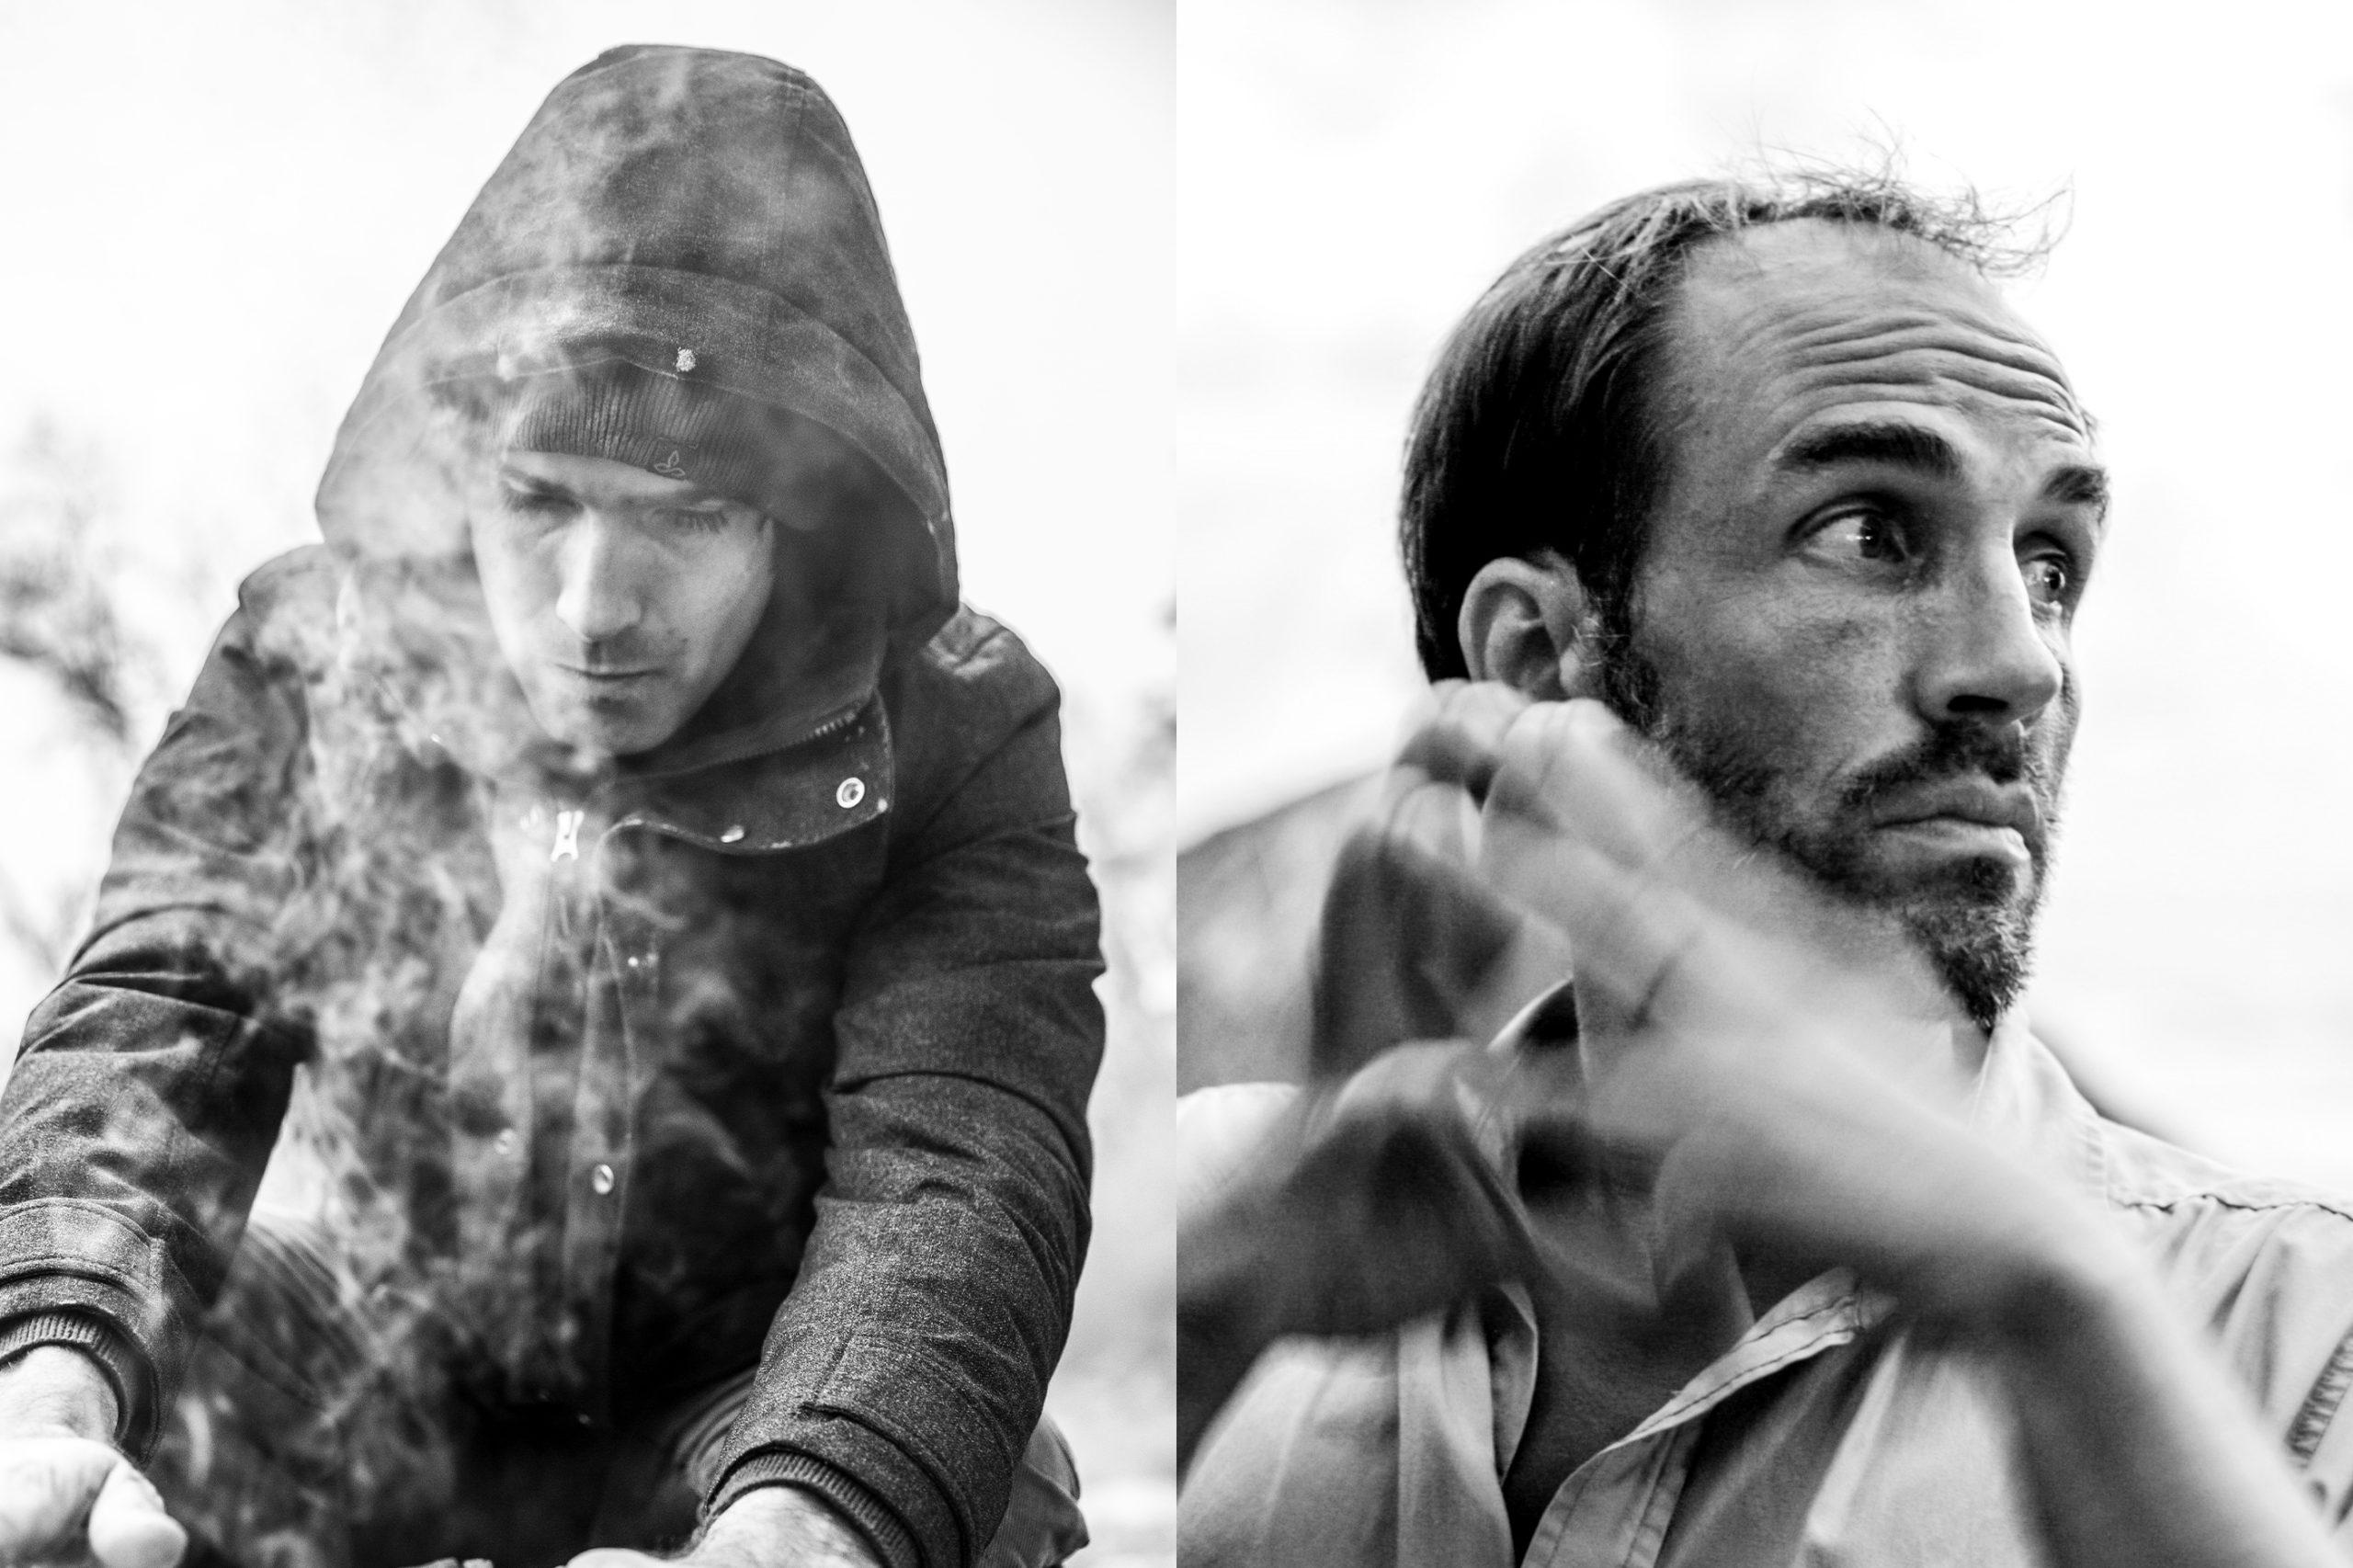 Rock climbers Chris Sharma and Boone Speed